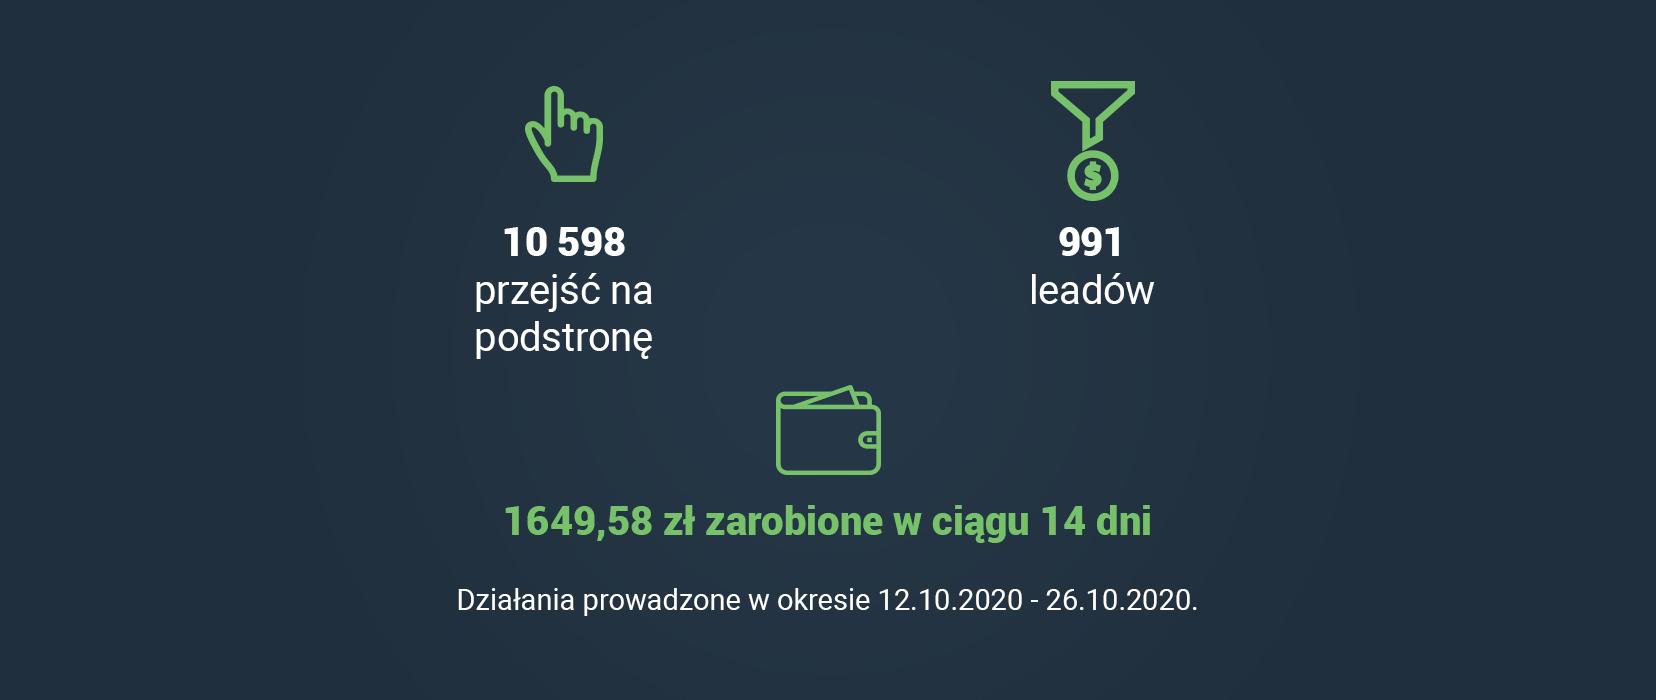 statystyki.png